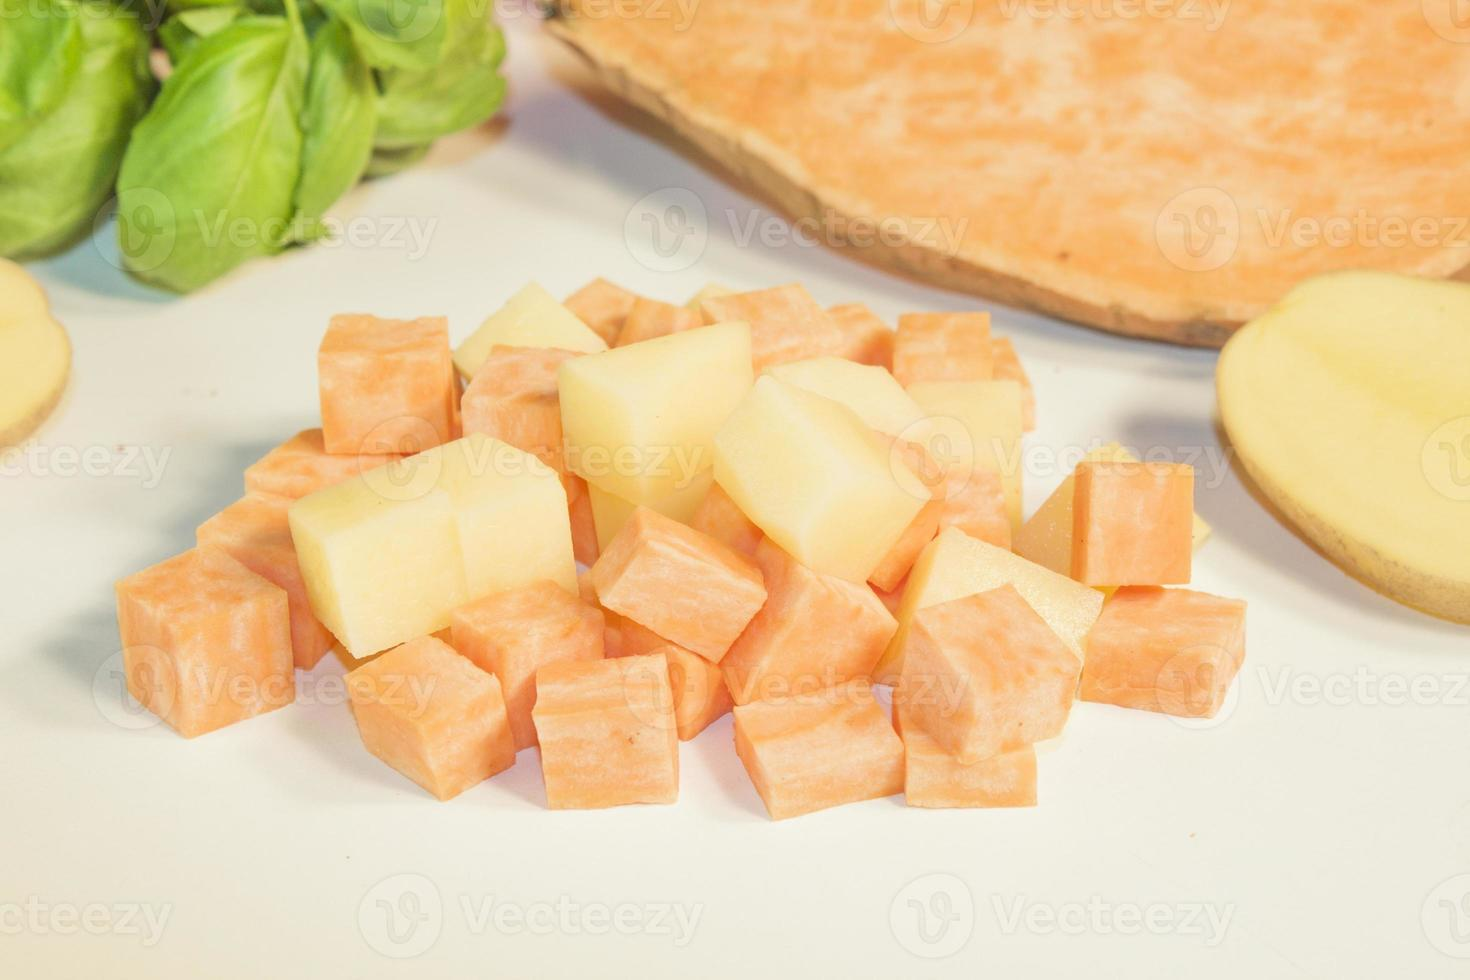 Potato and sweet potato photo